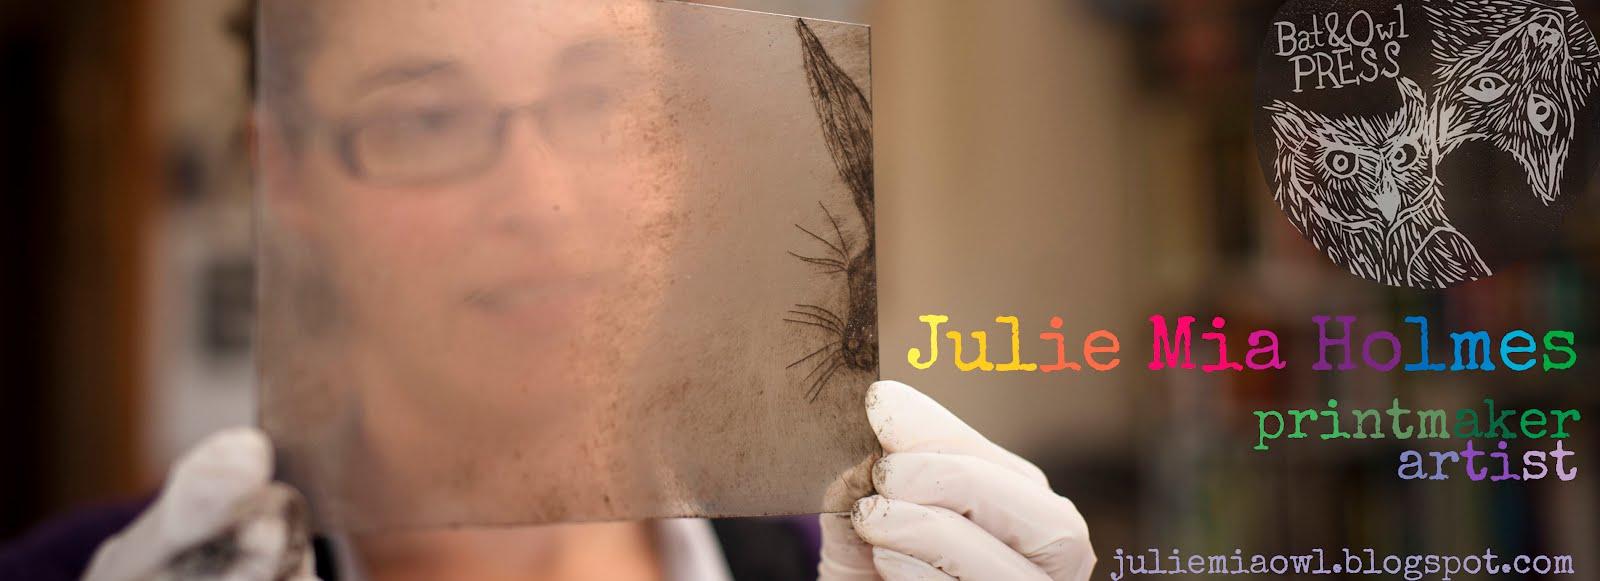 juliemiaowl